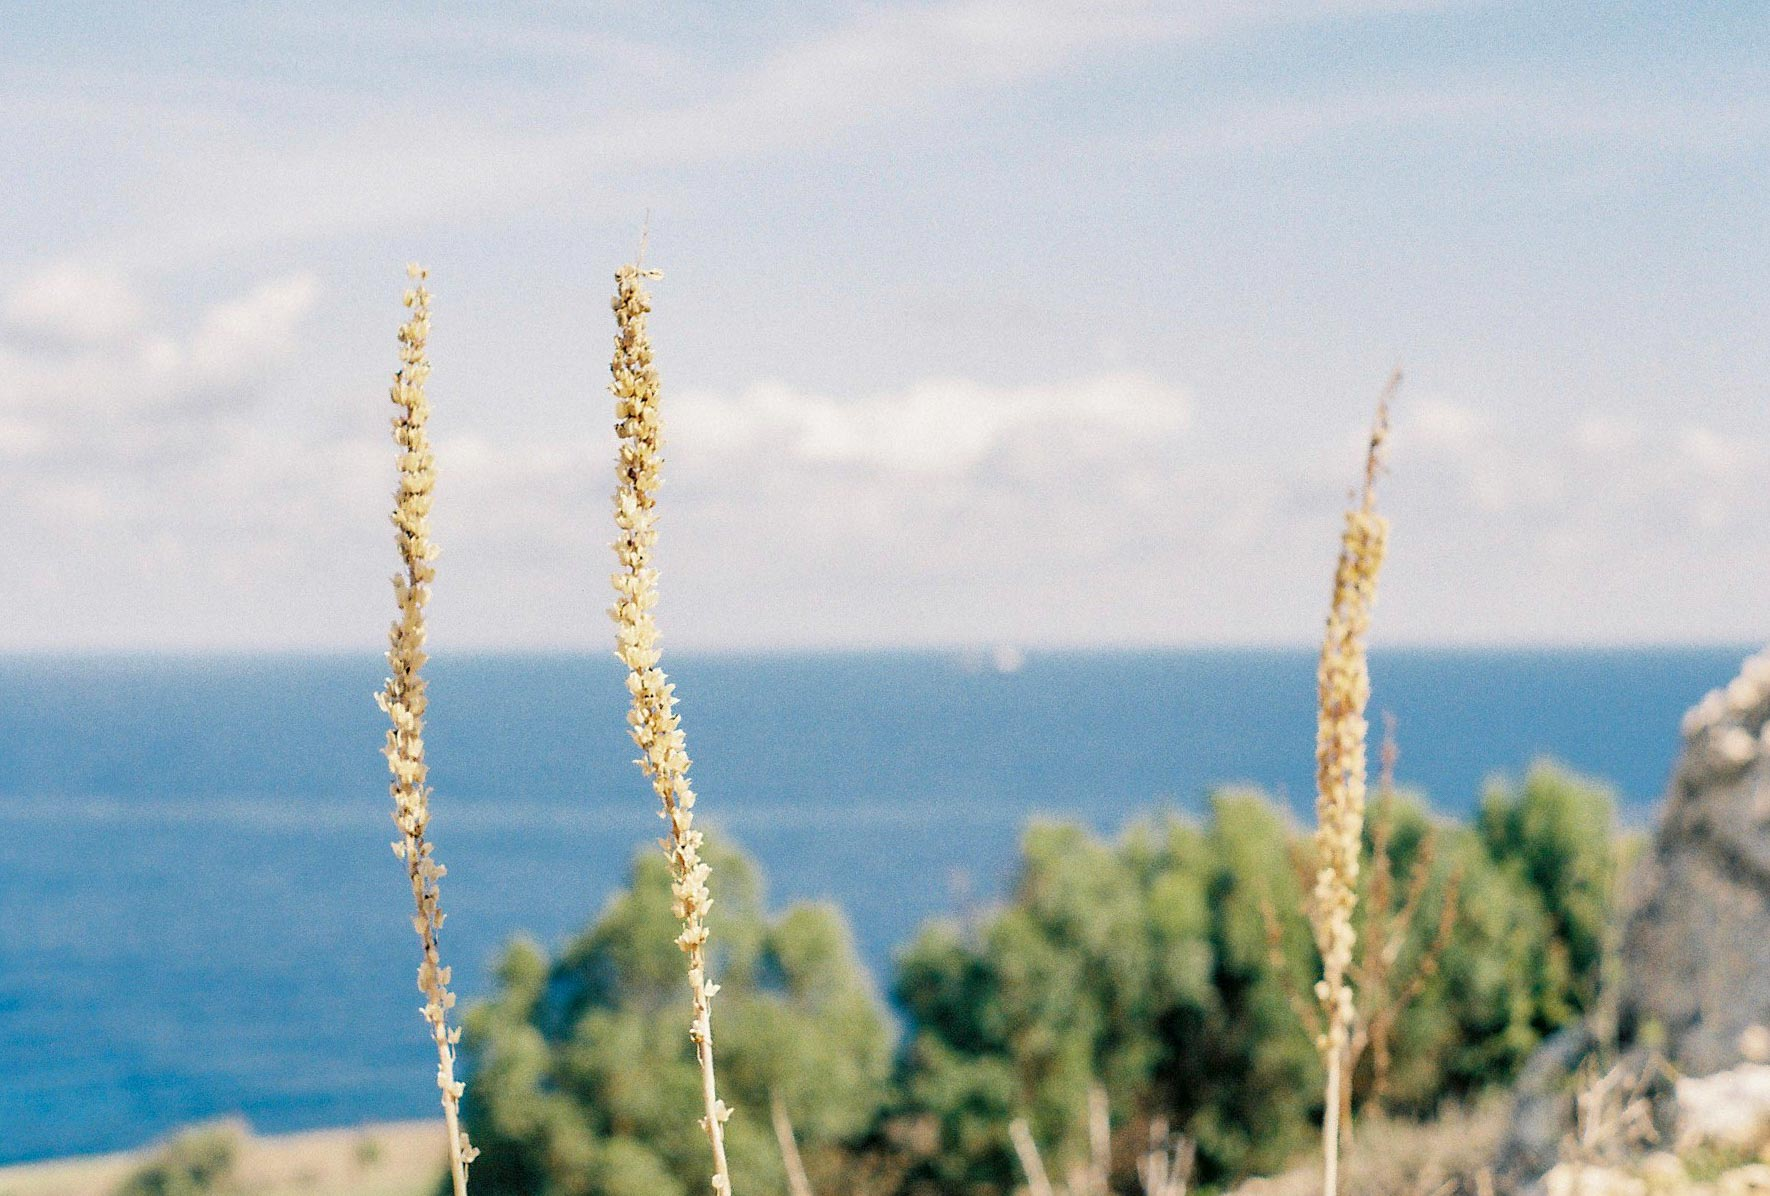 Malta plants